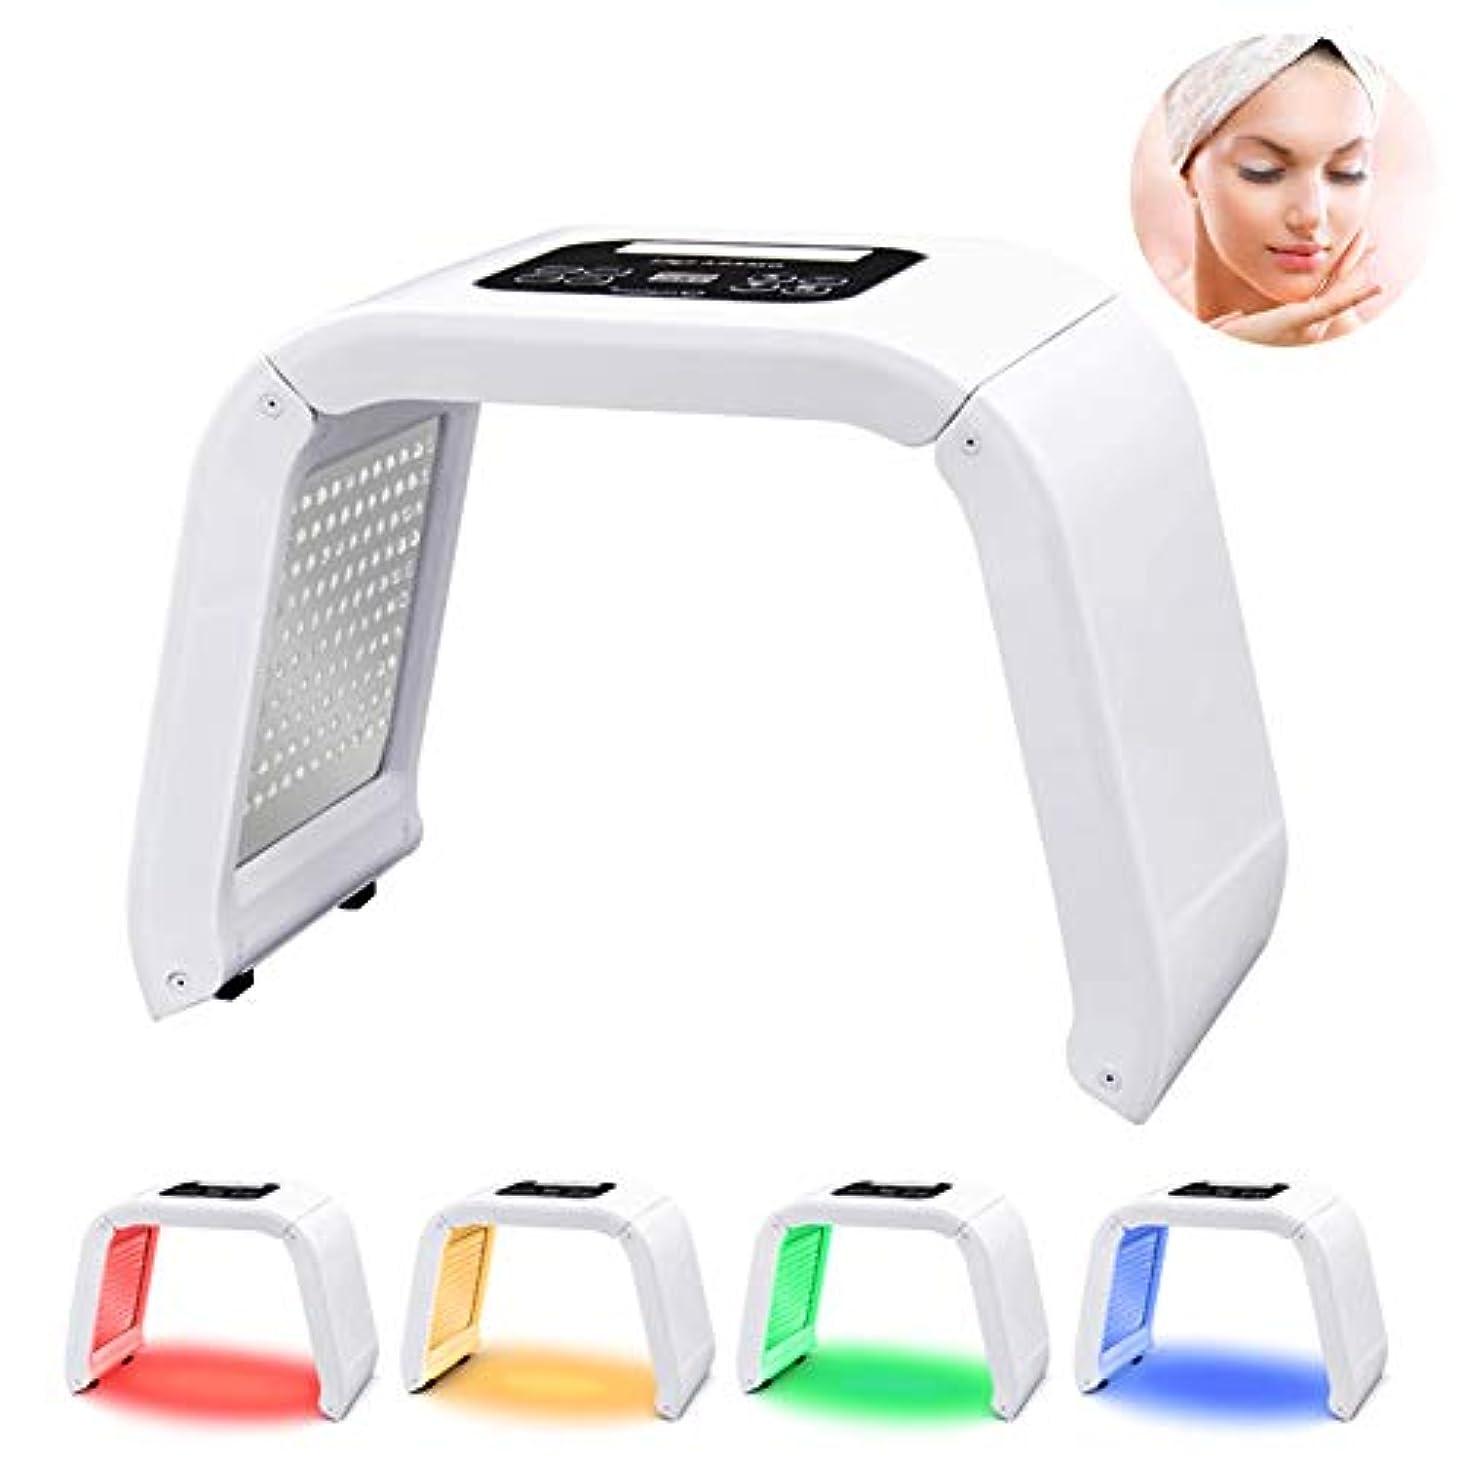 PDT 4-In-1 LEDライト光線療法電気スキンケア美容装置家庭用多機能体の美容スキンケア分光器のマシン女性のための完璧なギフト